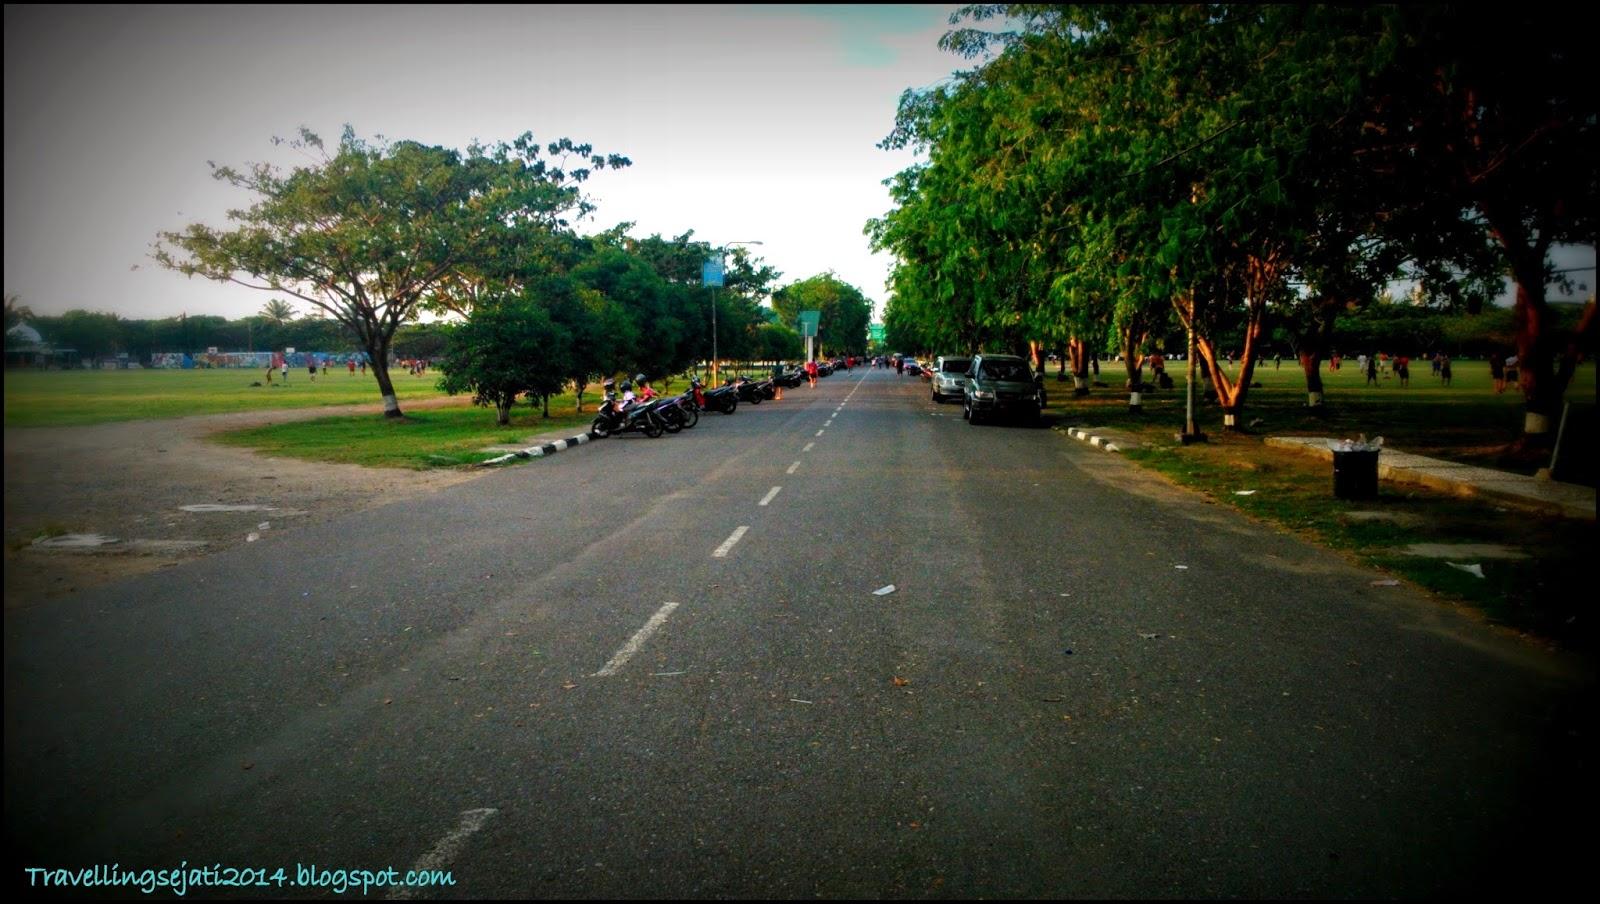 Lapangan Bersejarah Terletak Pusat Kota Banda Aceh Jalan Tengah2 Blang